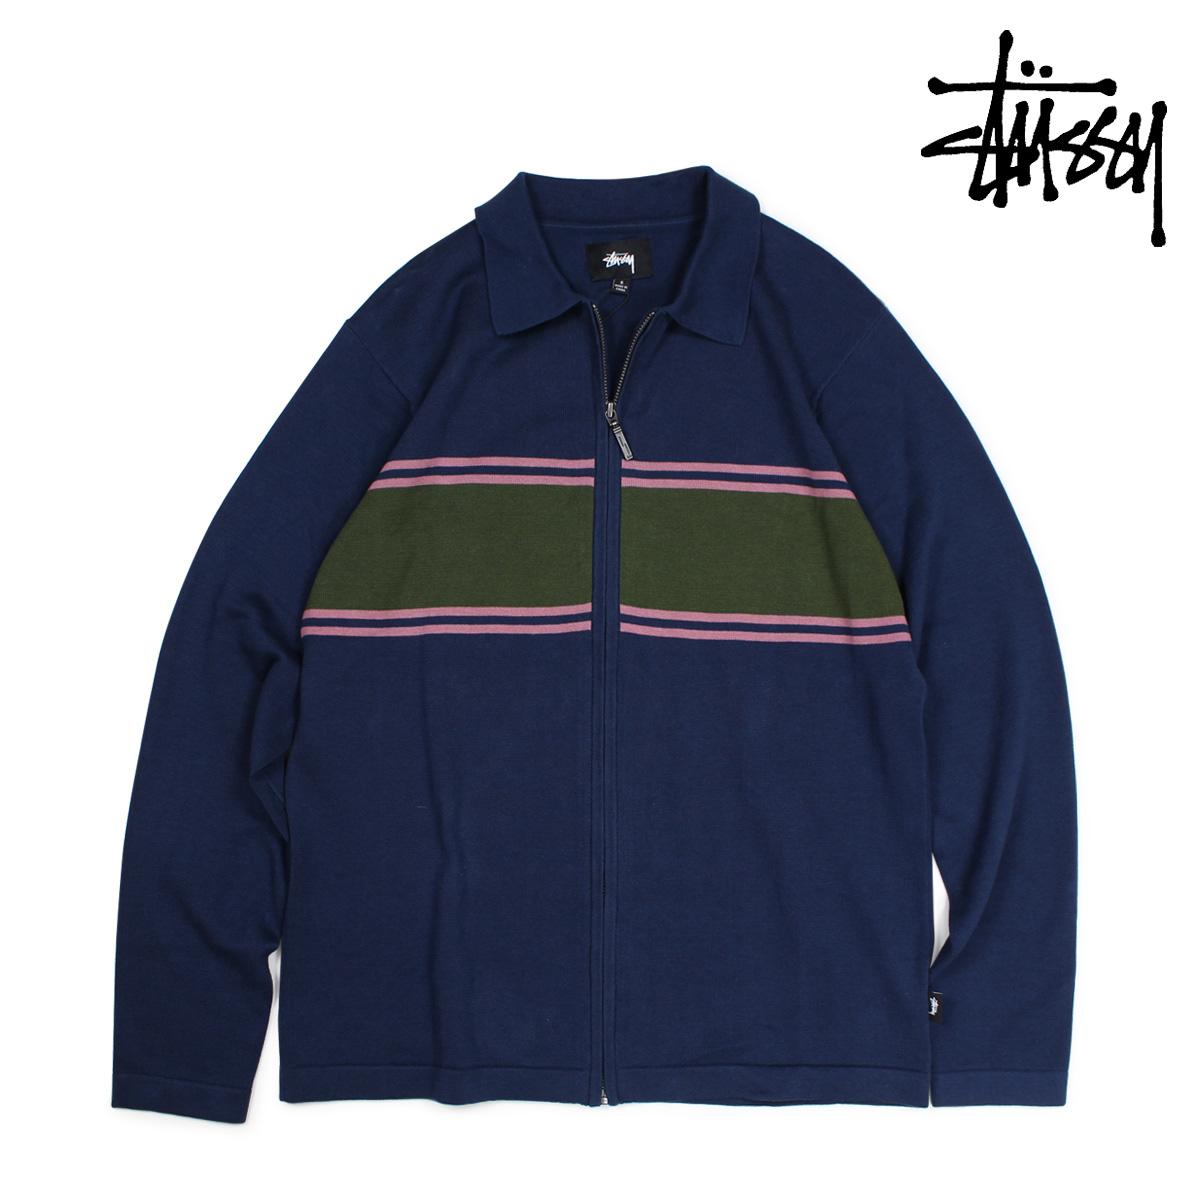 STUSSY ステューシー セーター メンズ ポロセーター CODY STRIPE LS POLO SWEATER ネイビー 117050 【決算セール 返品不可】